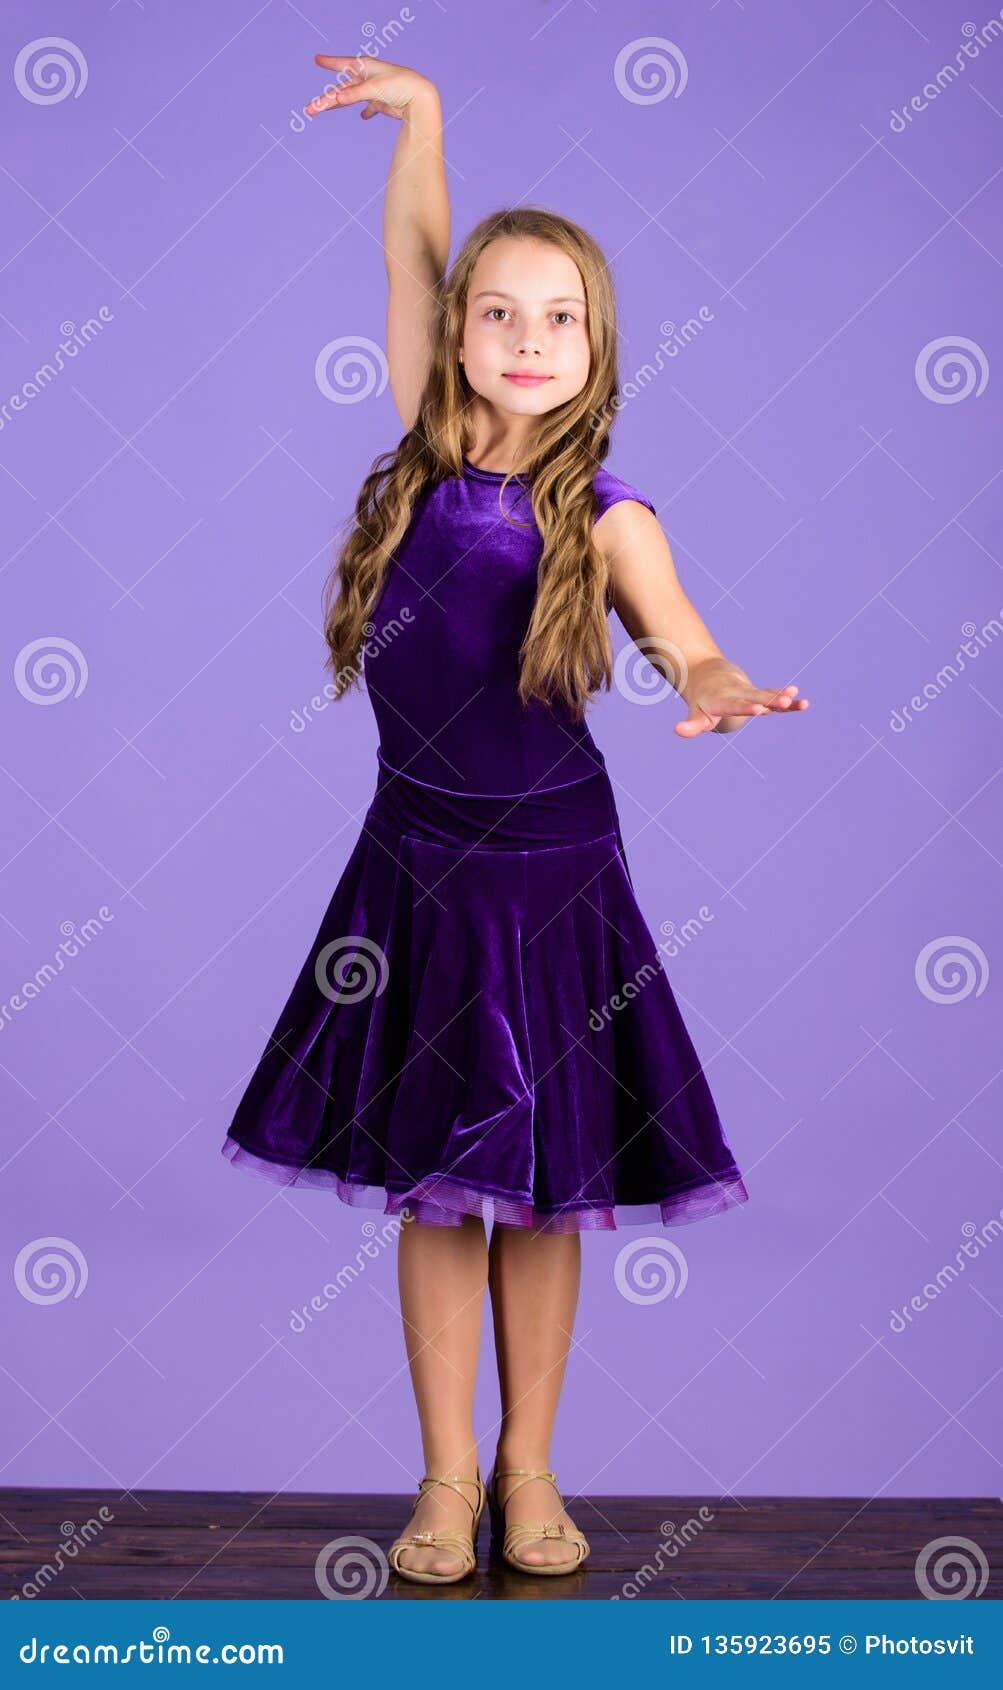 Clothes for ballroom dance. Kids fashion. Kid fashionable dress looks adorable. Ballroom dancewear fashion concept. Kid